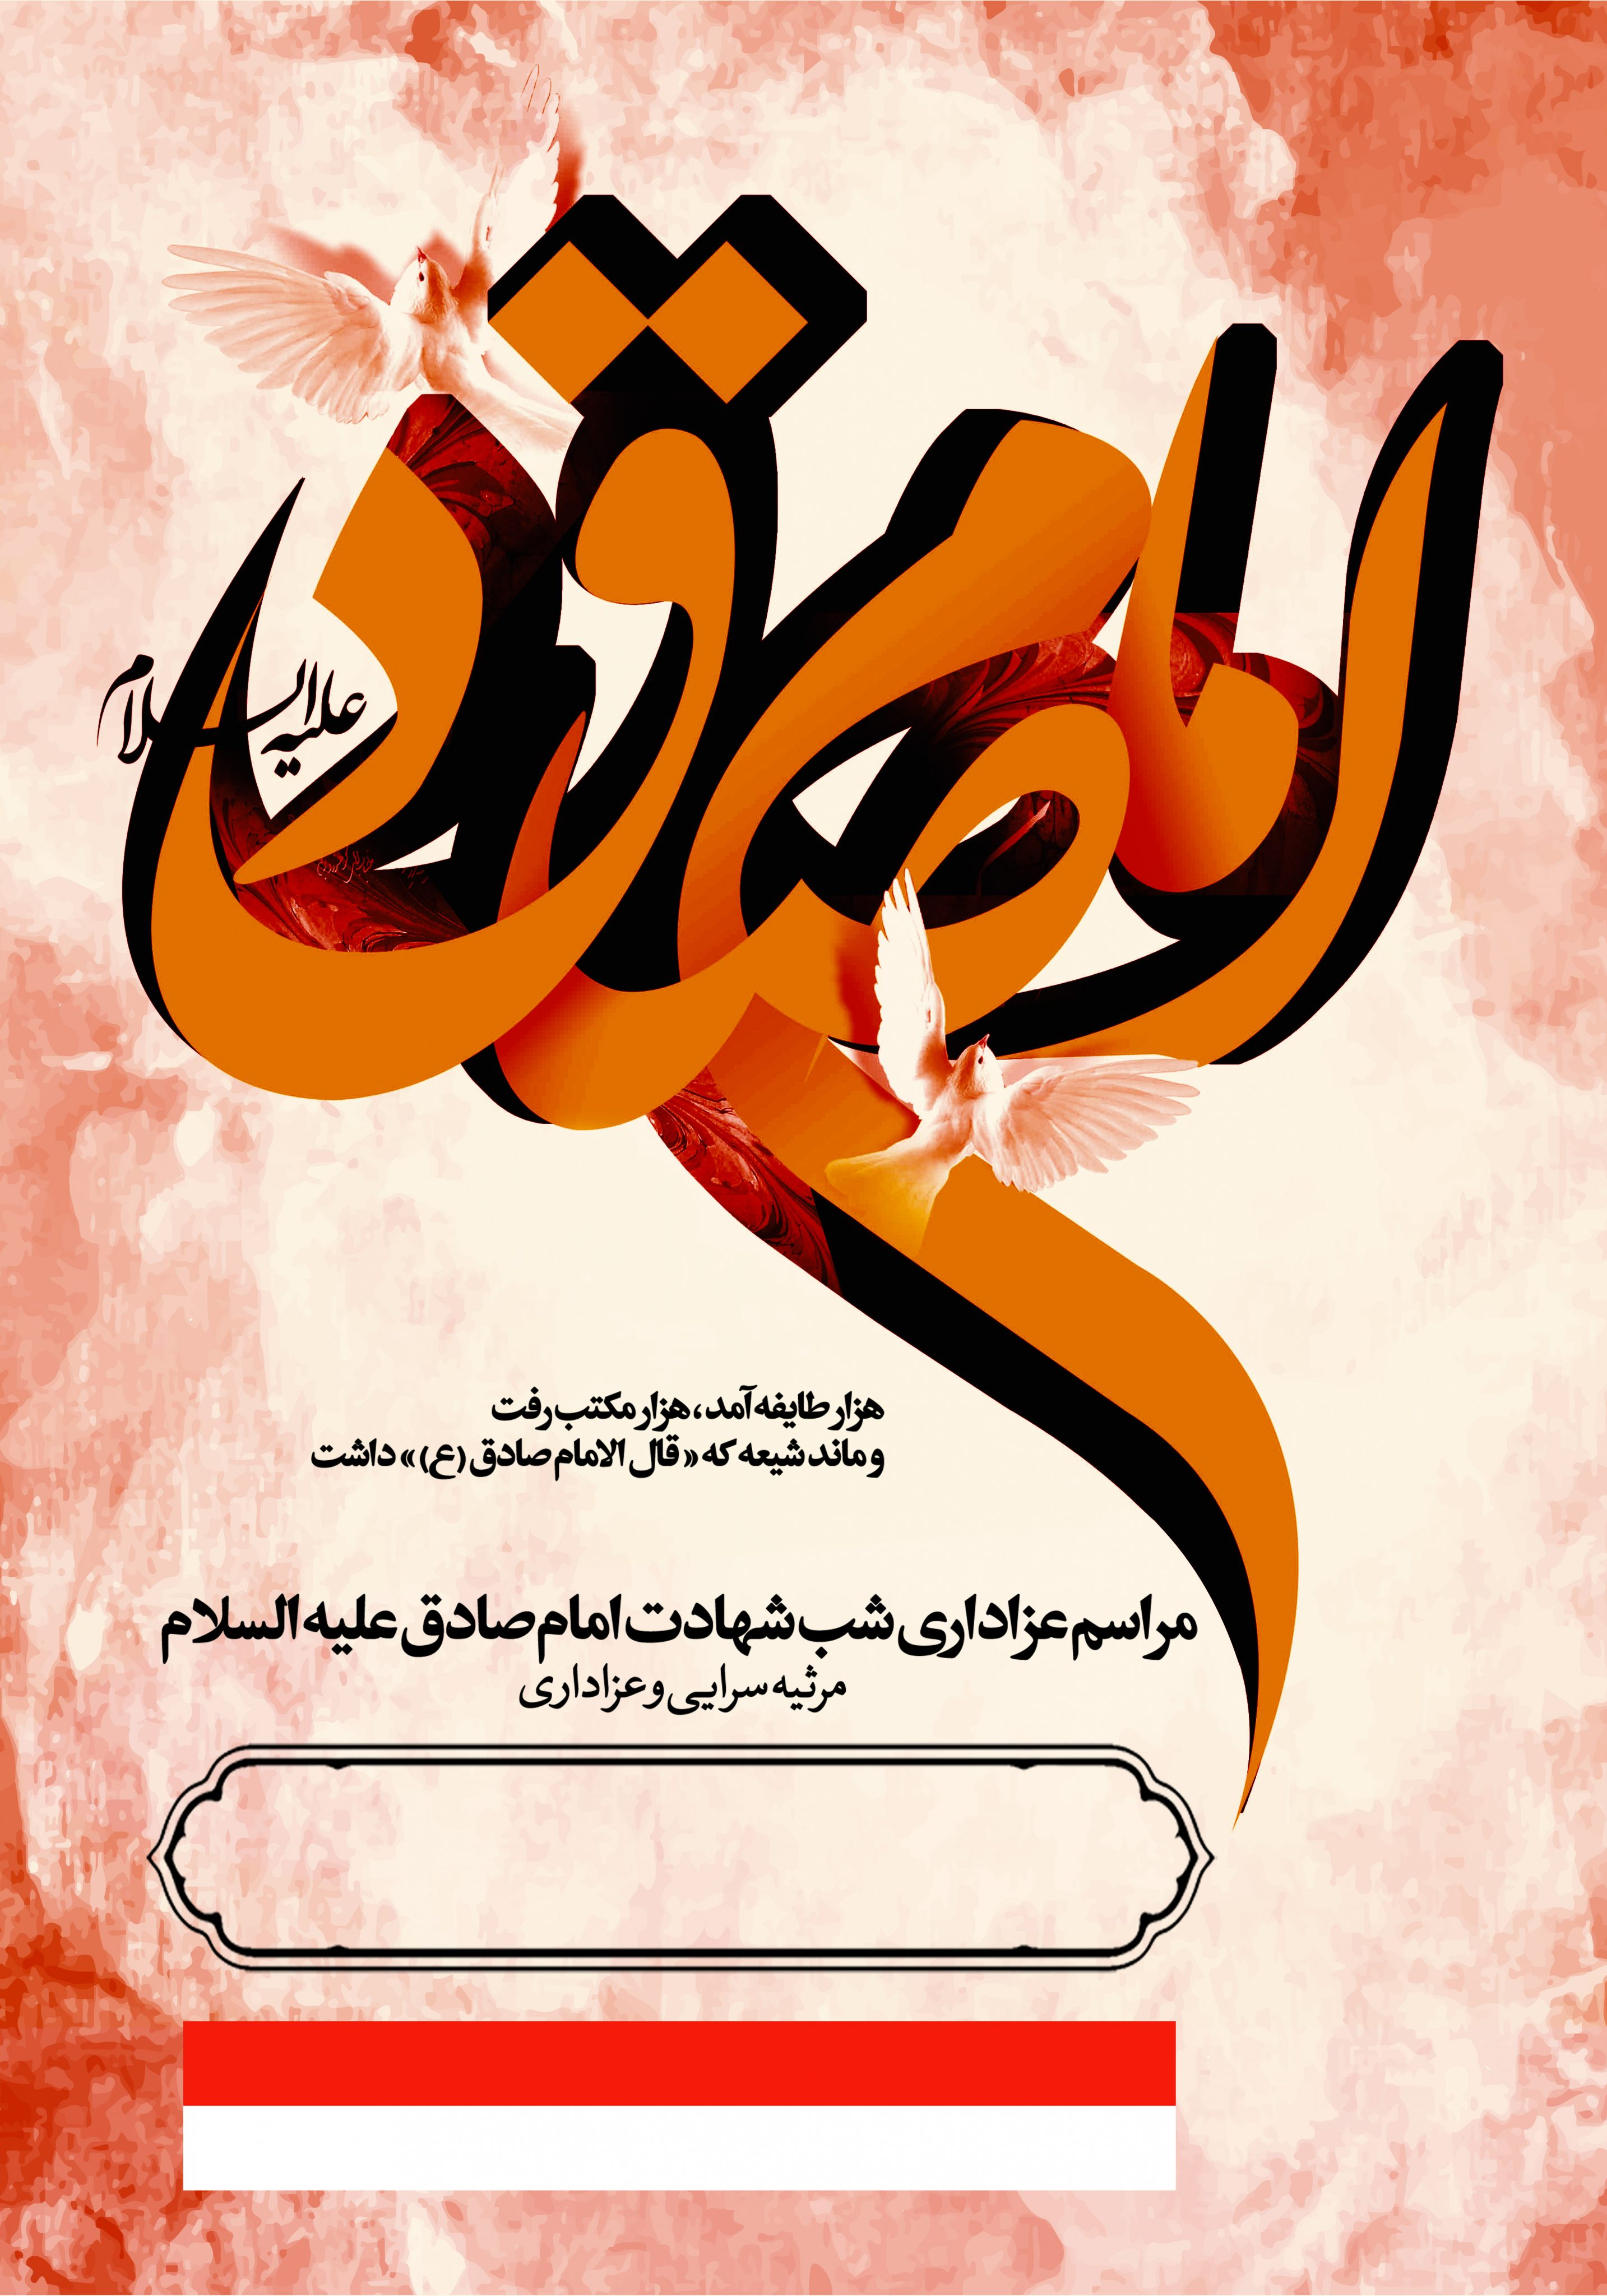 تراکت اطلاع رسانی شهادت امام صادق علیه السلام